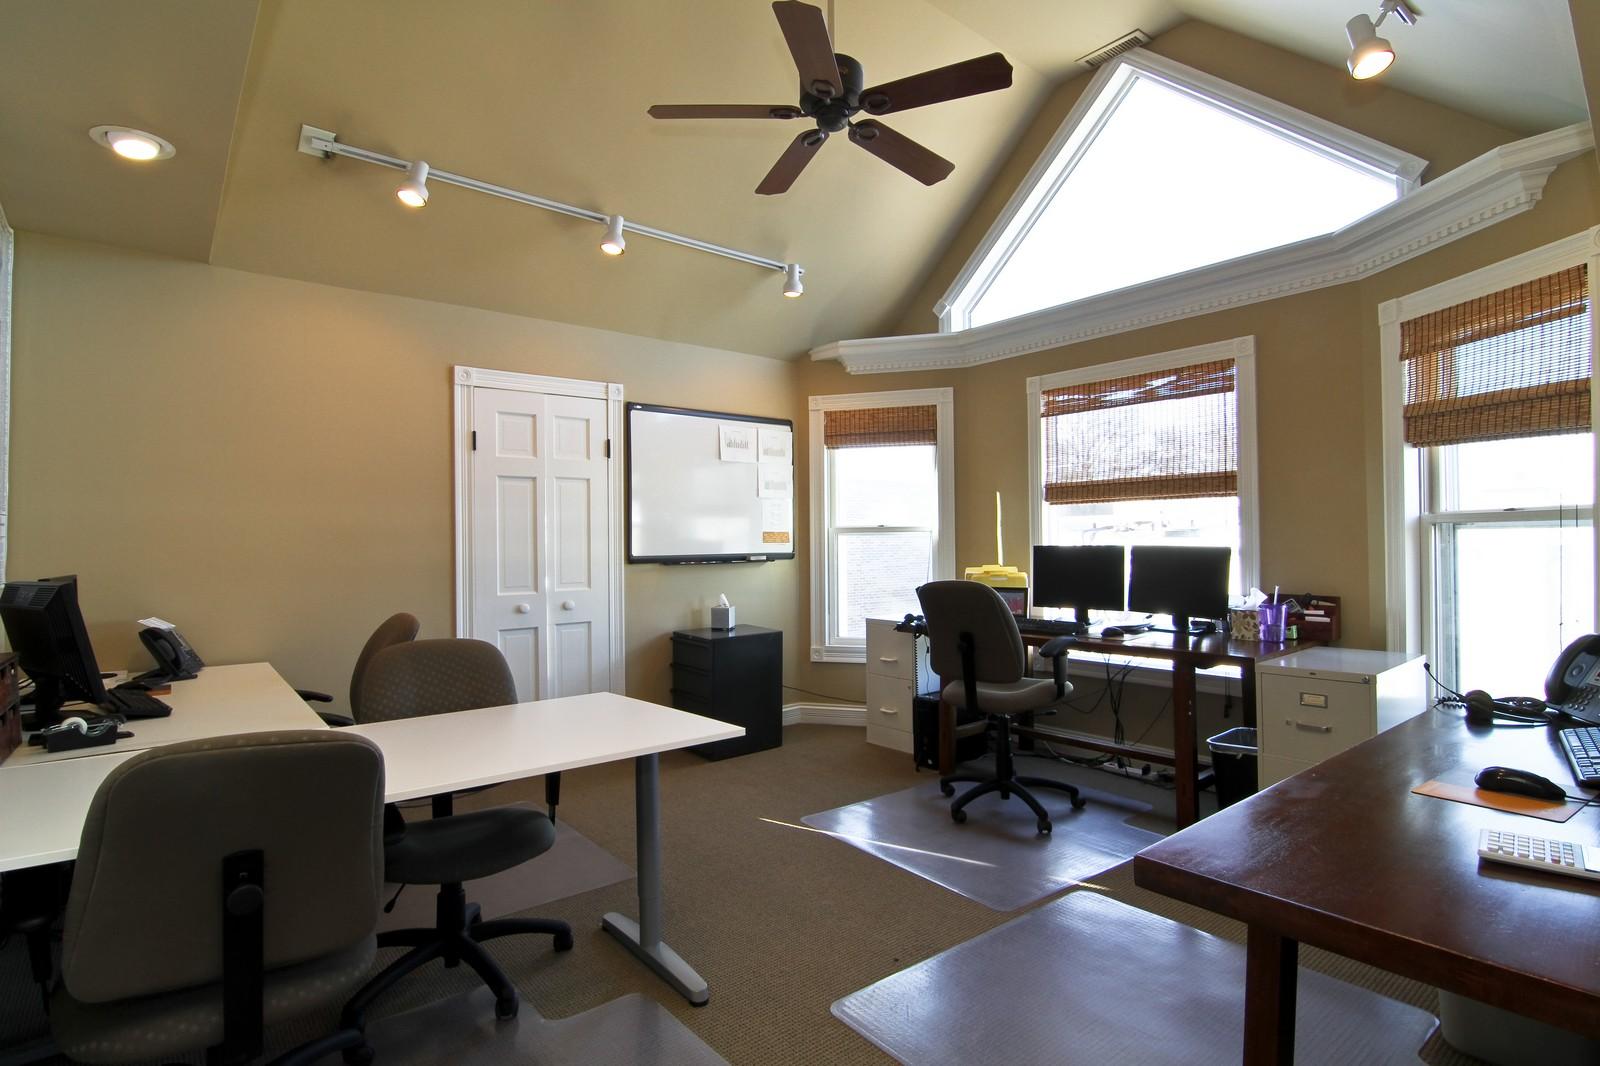 Real Estate Photography - 310 S Hale St, Wheaton, IL, 60187 - Location 5